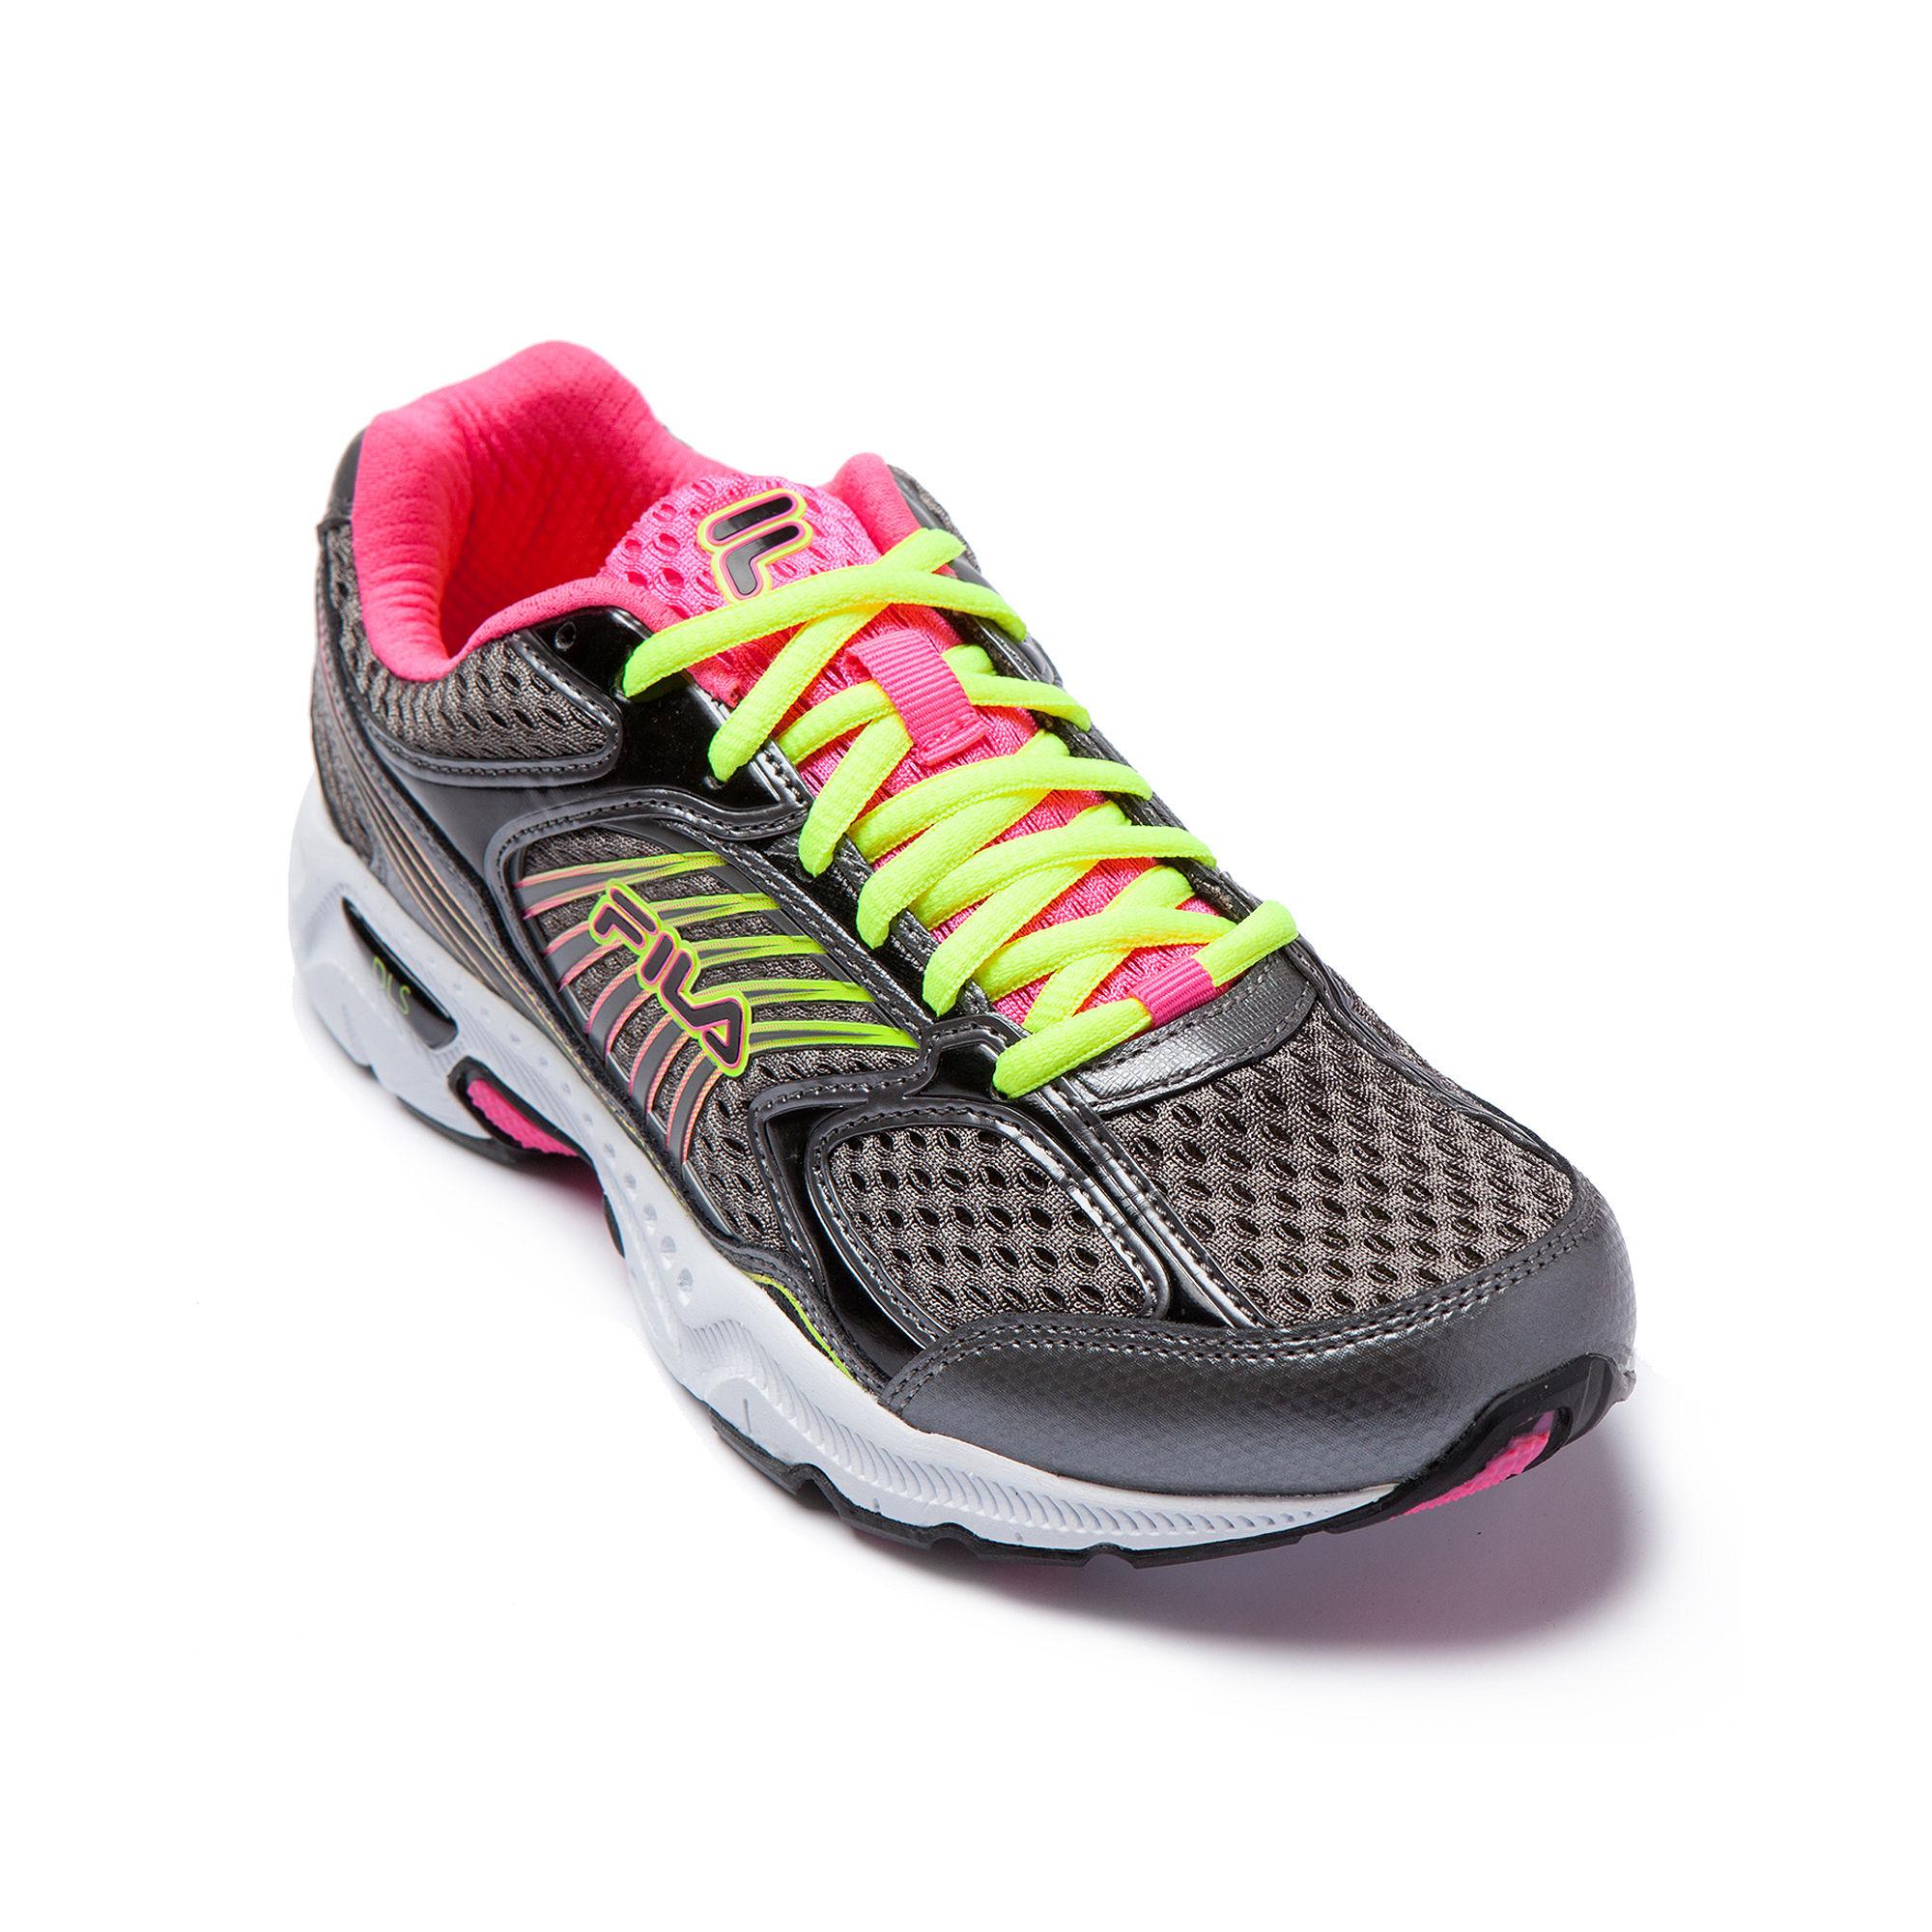 Fila Upc 731616631851 Running Inspell Shoes Womens g0qw5U0